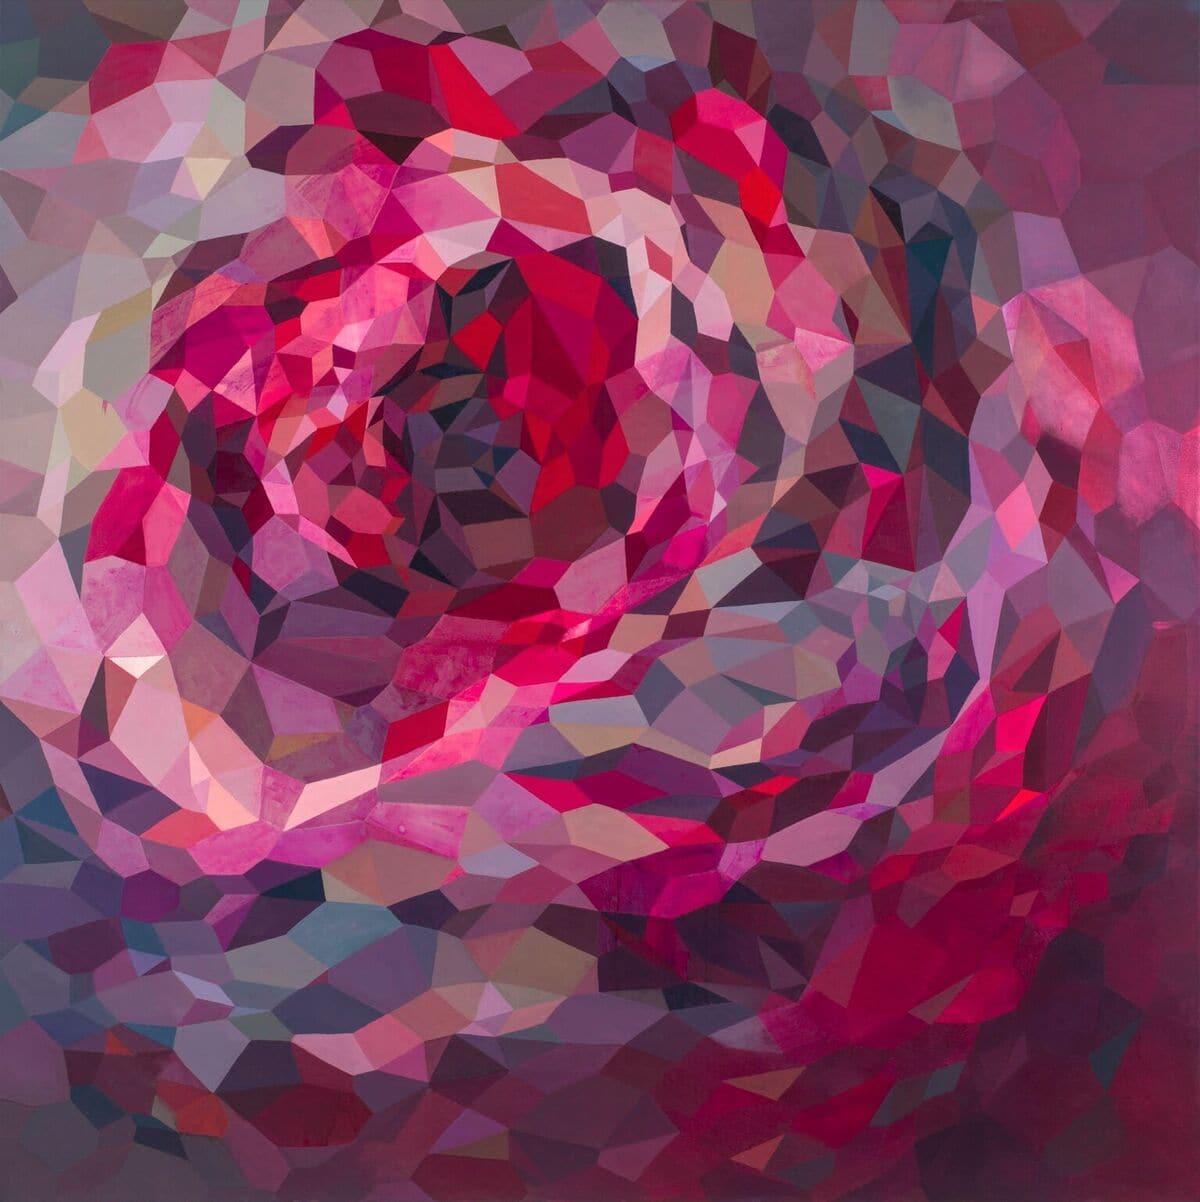 Mesmerise By Lyndal Hargrave